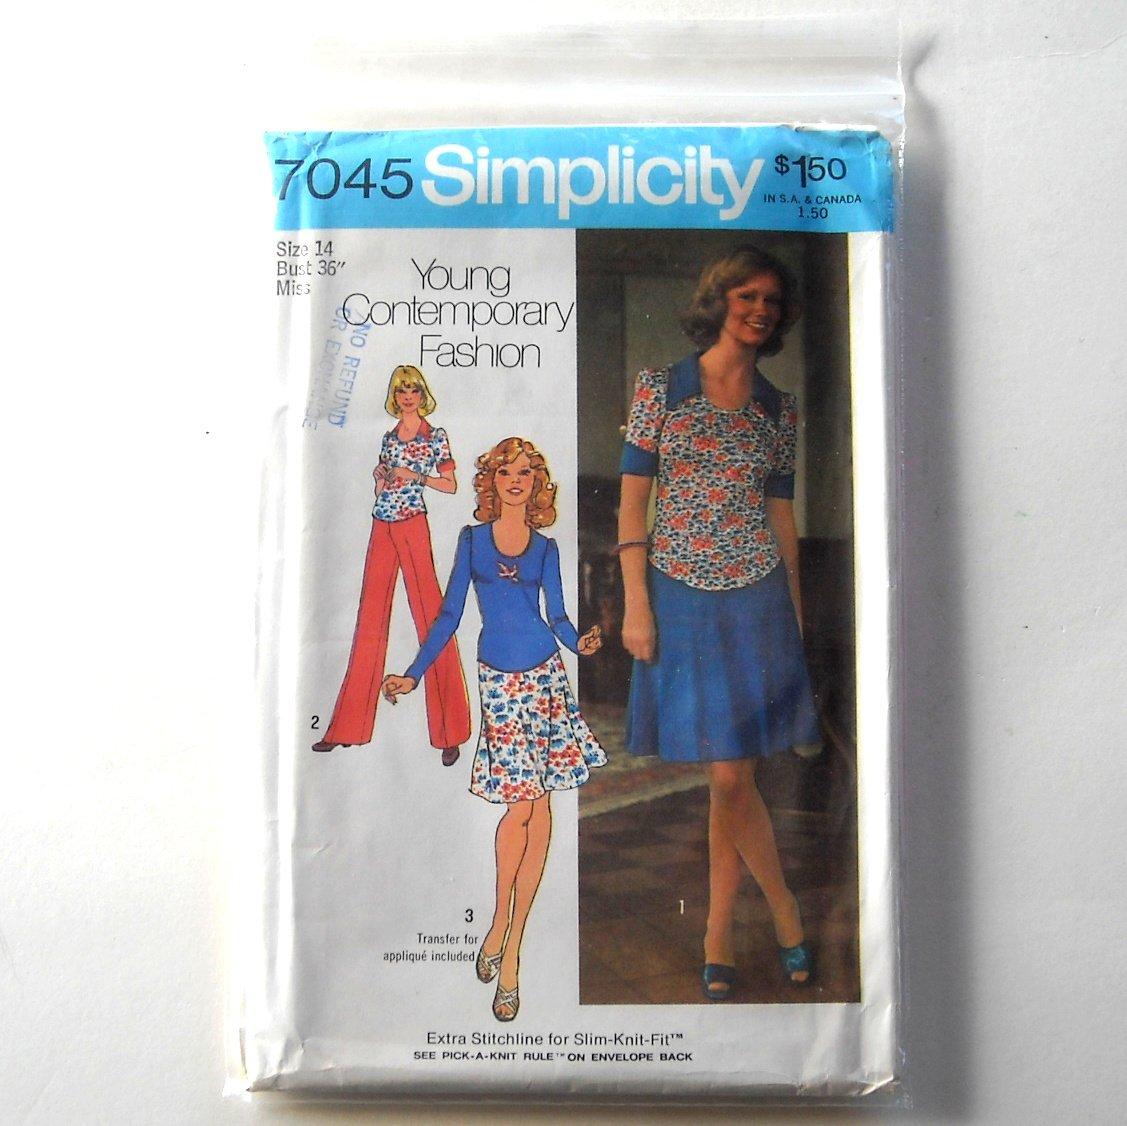 Misses Short Dress Top Skirt Pants Size 14 Vintage Simplicity Sewing Pattern 7045